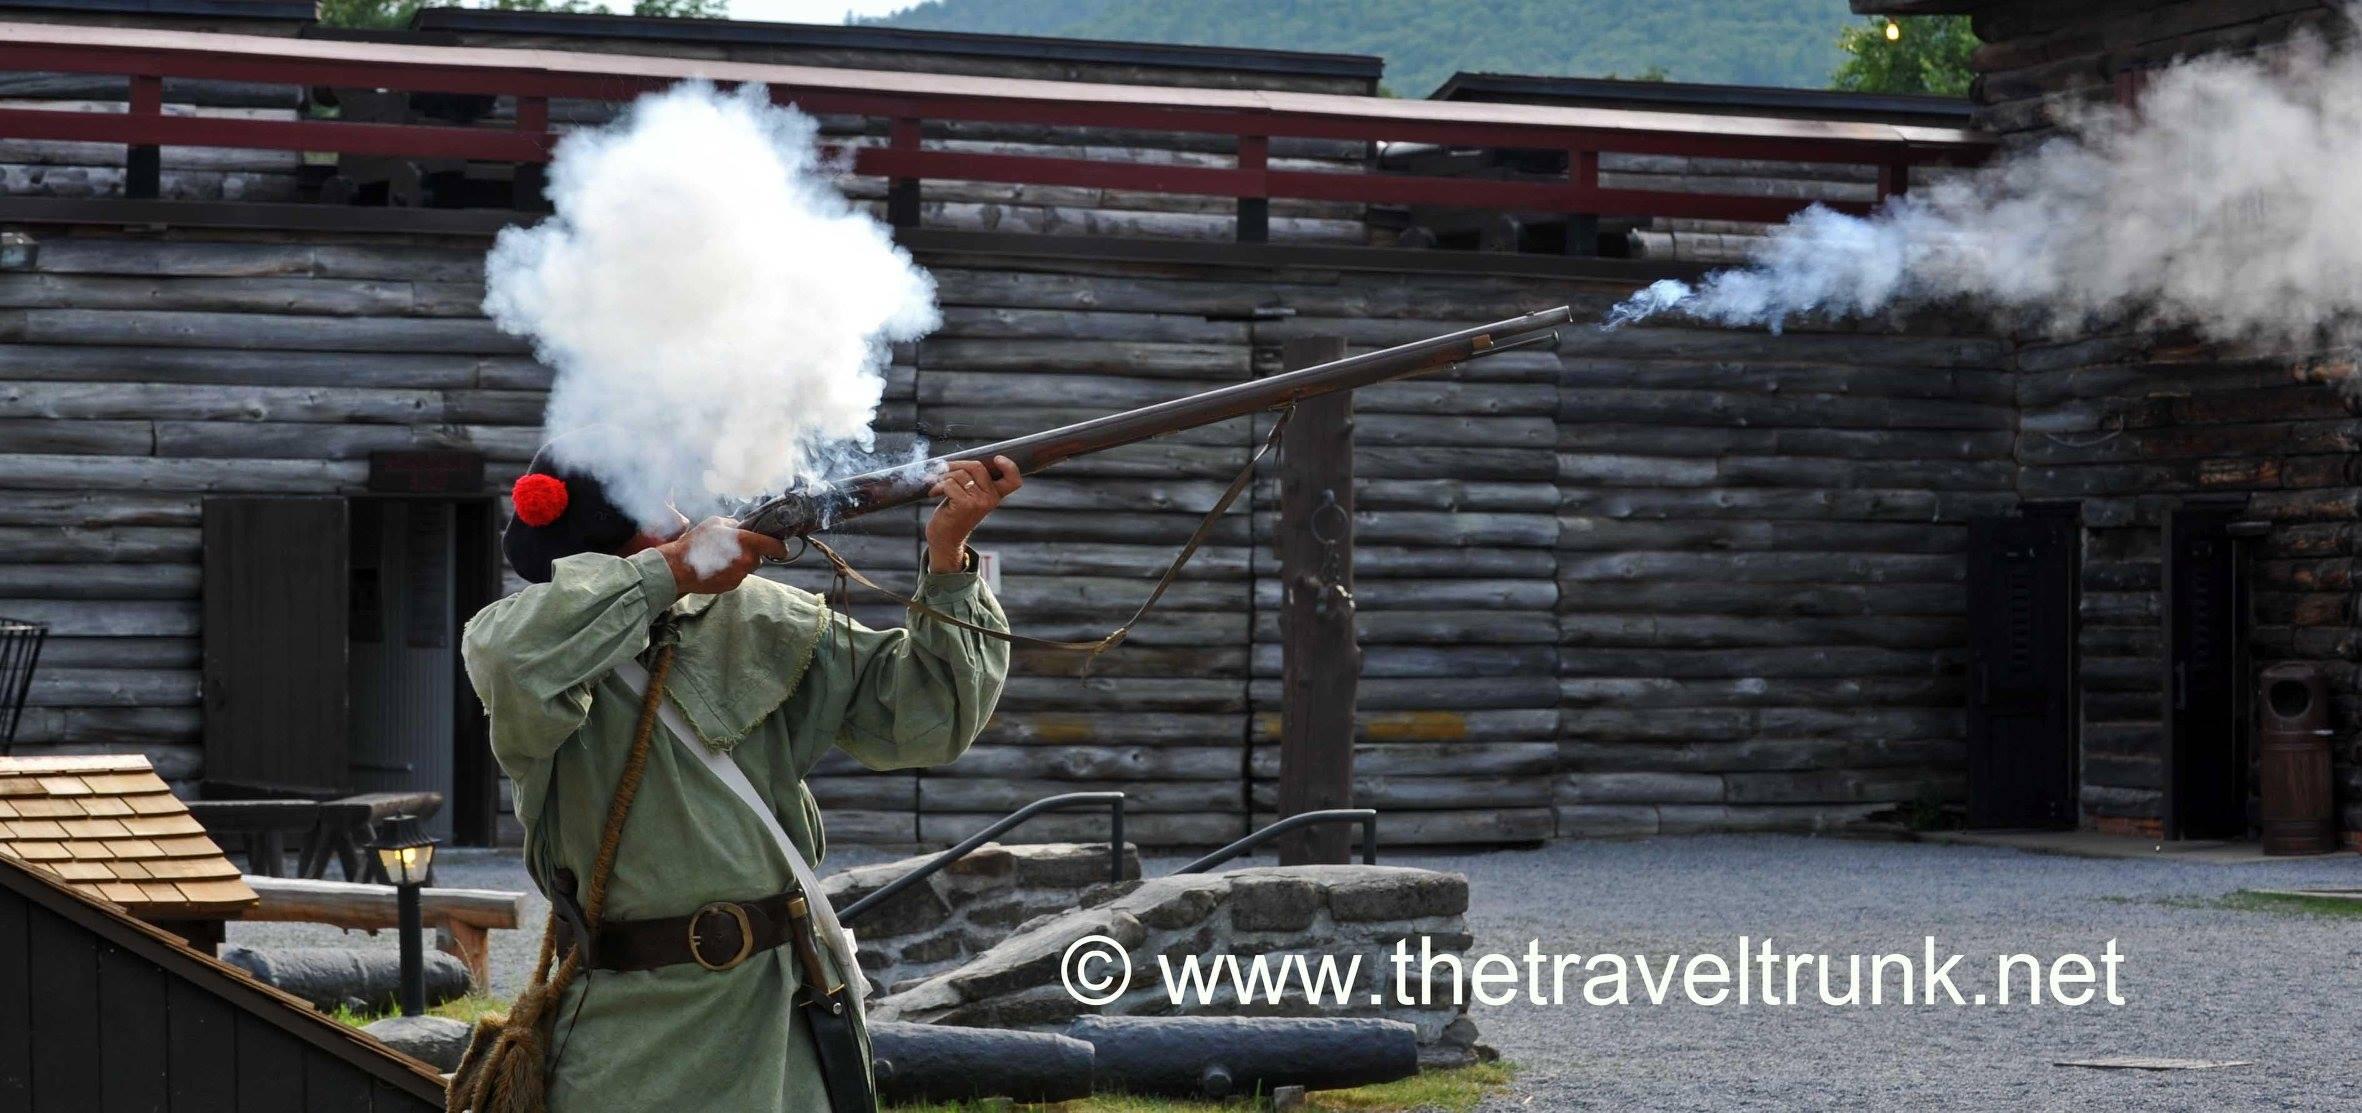 Costumed colonial American Ranger fires his gun